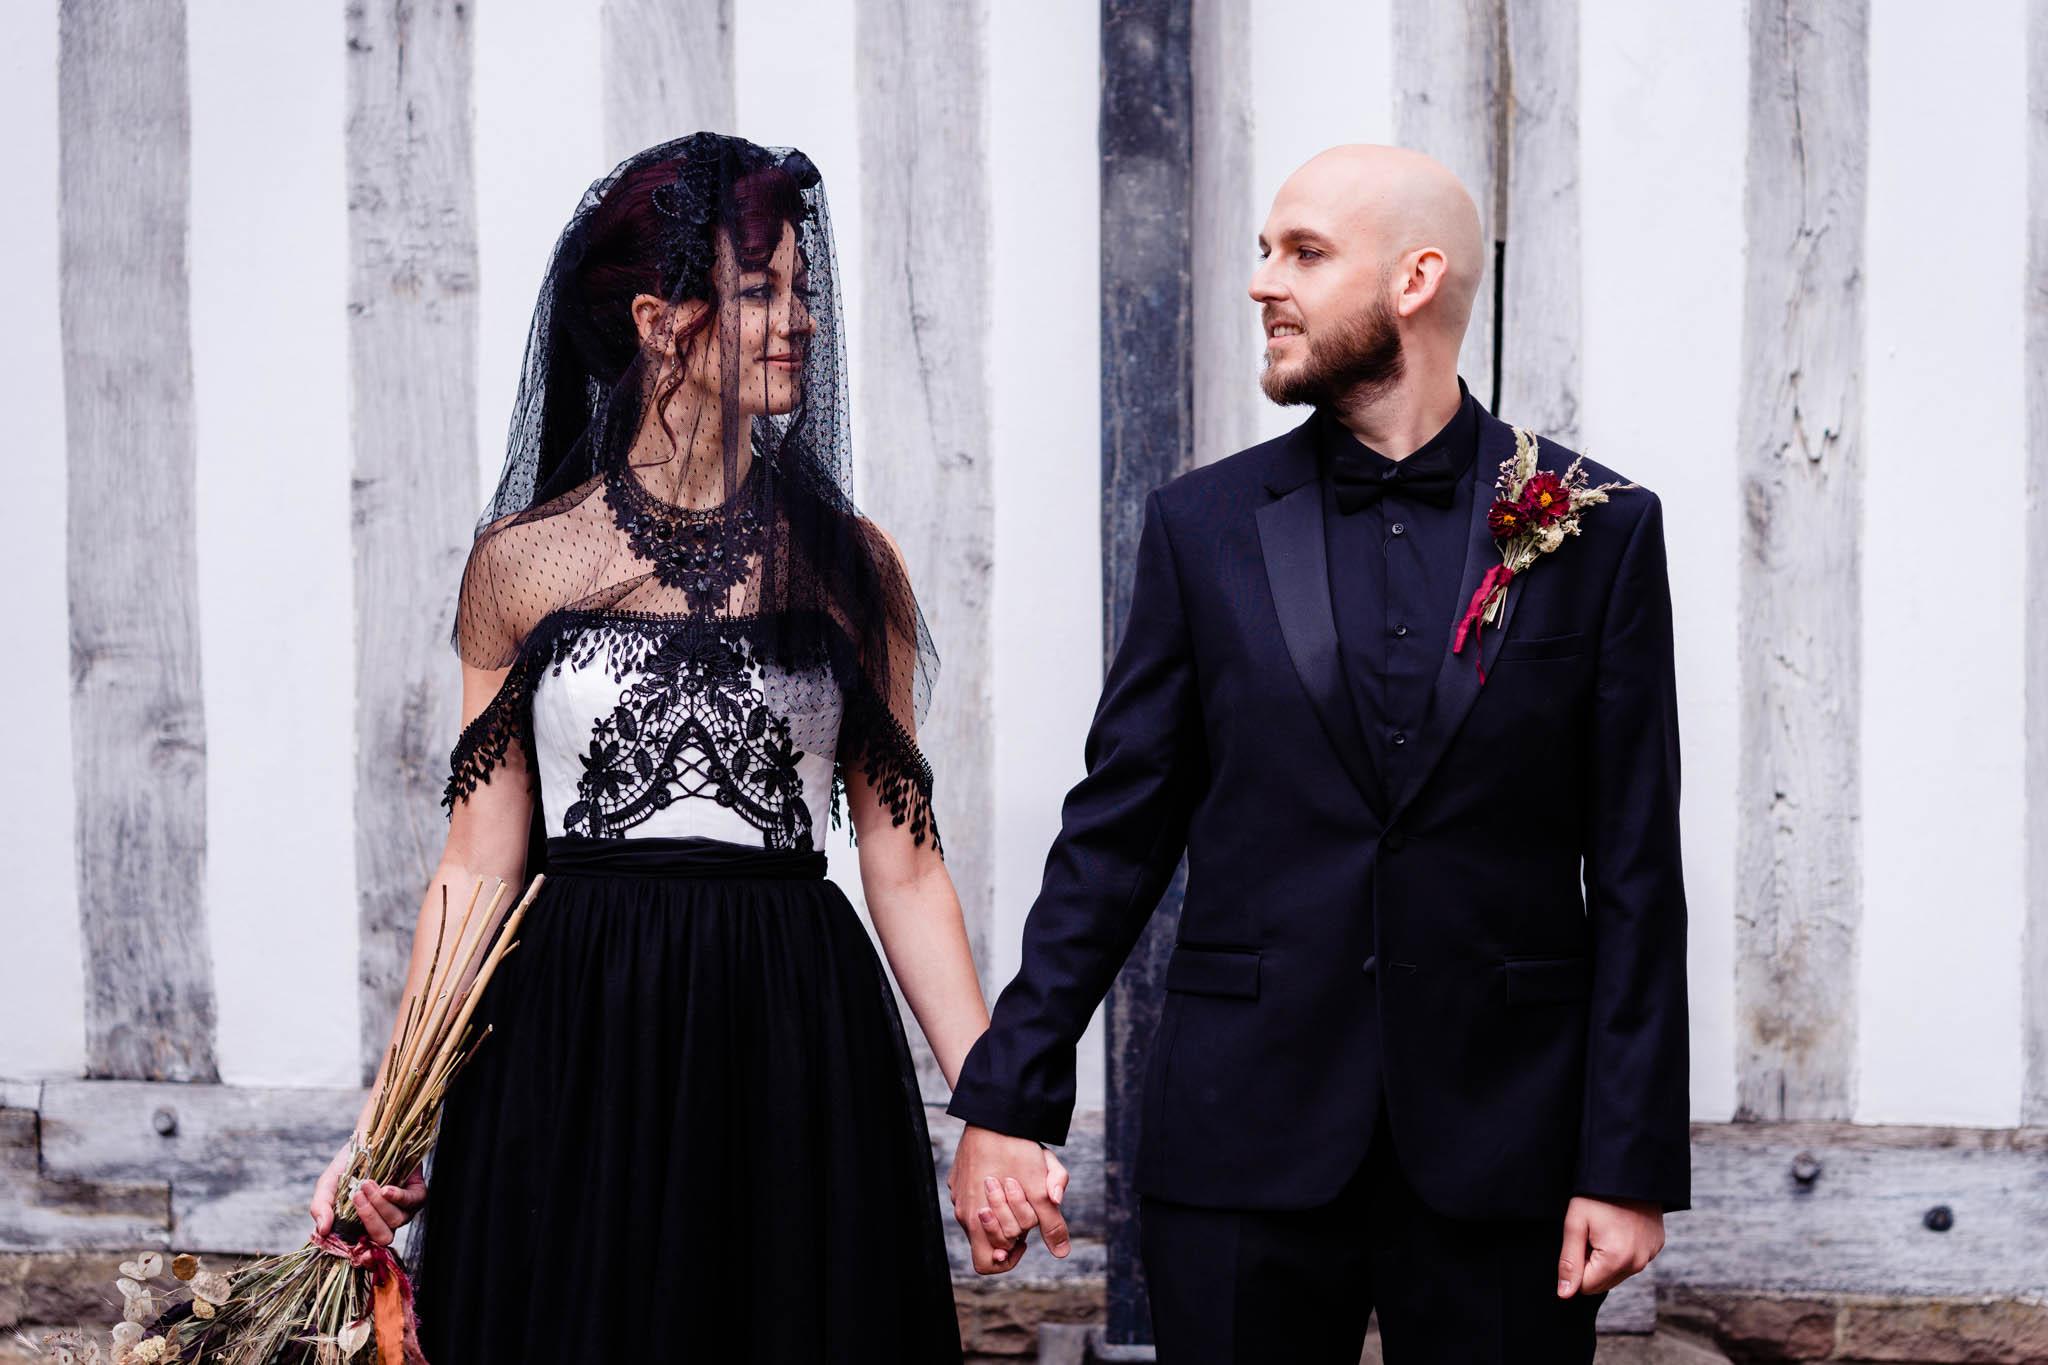 black bridal veil - gothic wedding dress -elegant gothic wedding - gothic wedding - alternative wedding